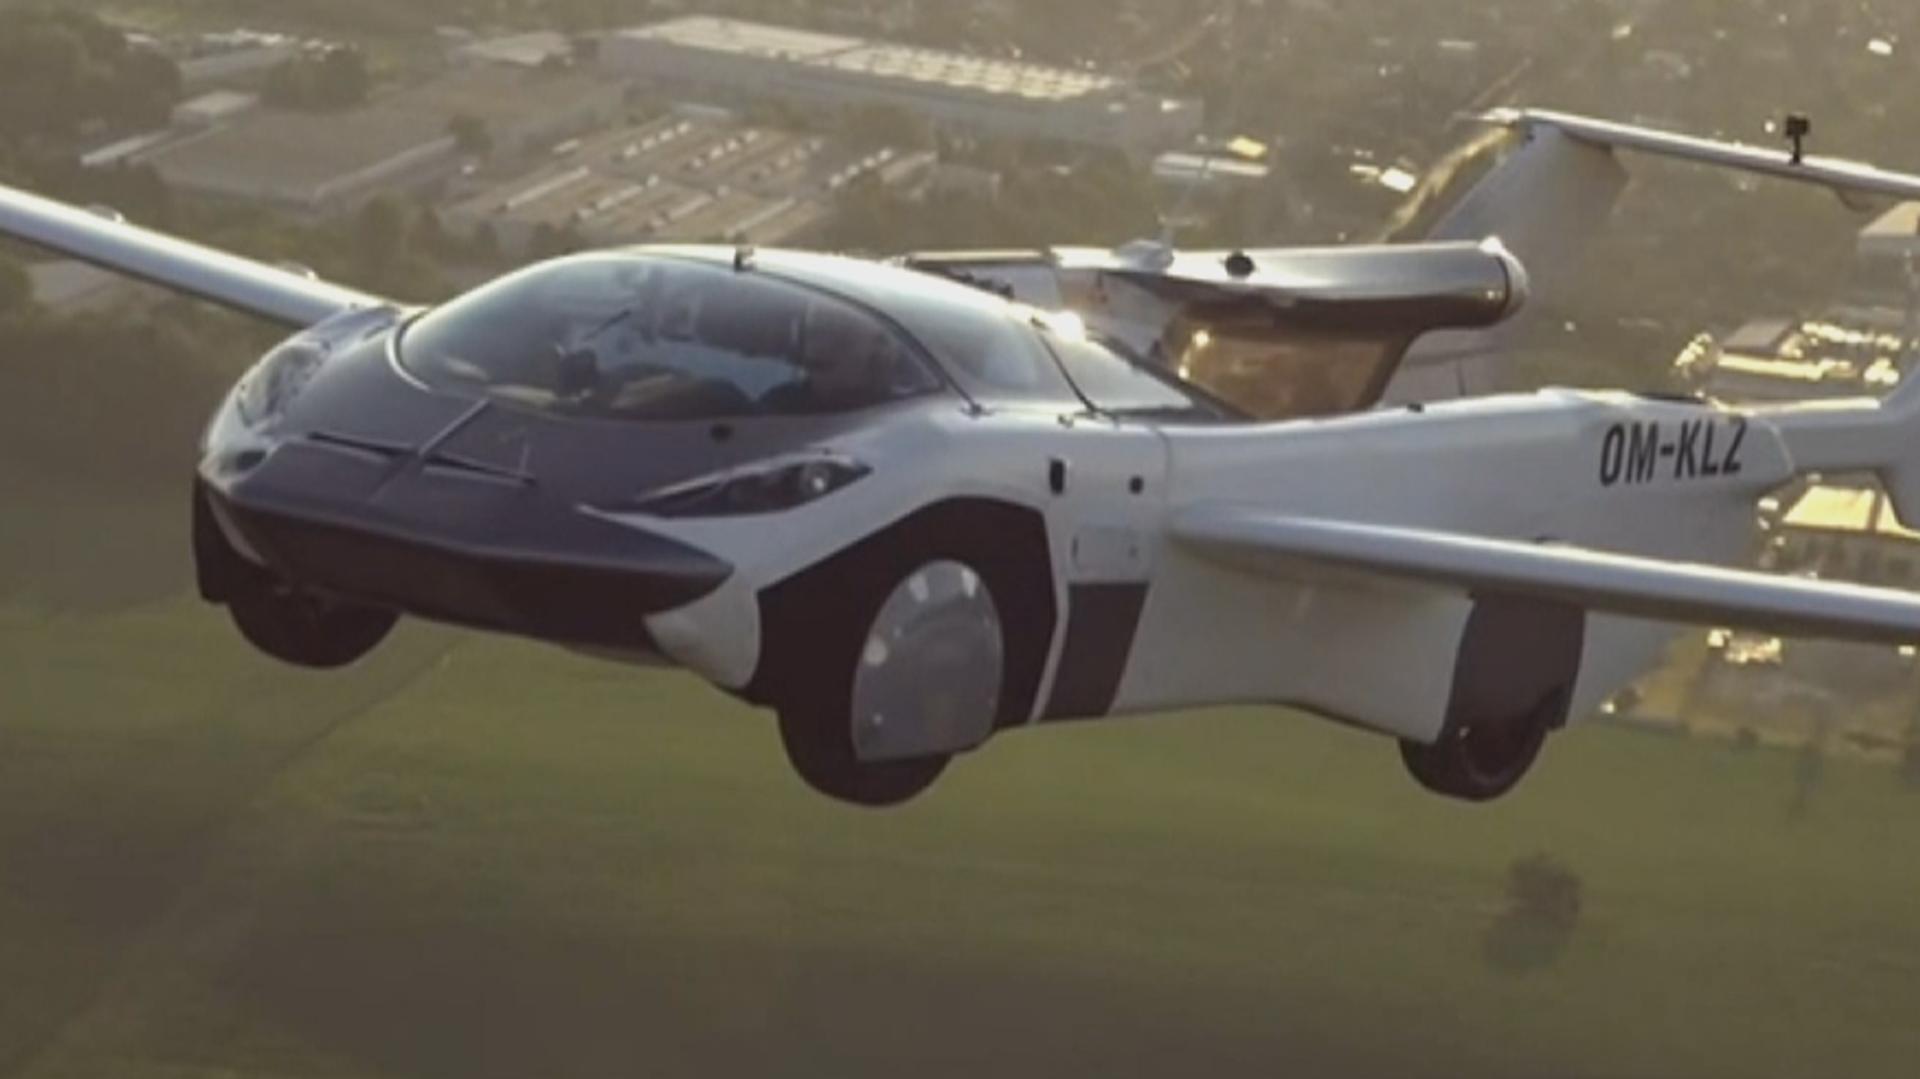 35 Minuten am Himmel: Fliegendes Auto AirCar absolviert erfolgreich Erstflug - SNA, 1920, 01.07.2021